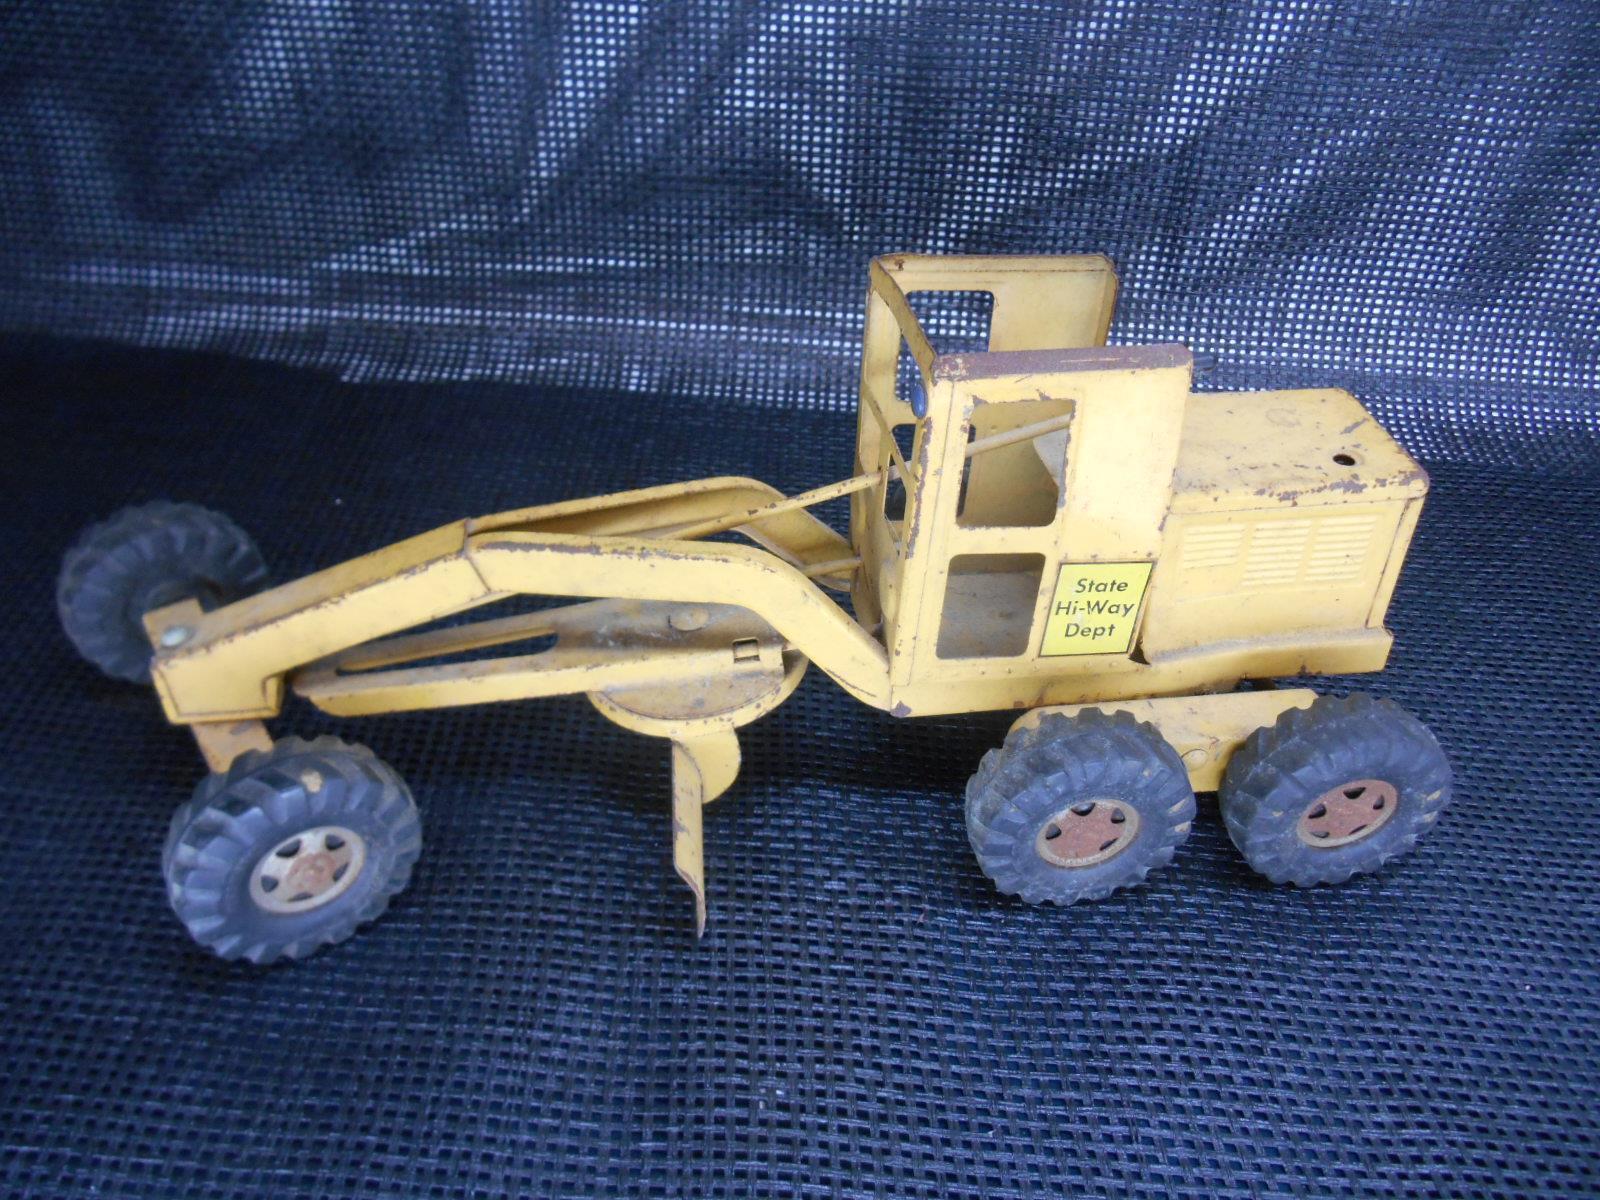 Old vintage TONKA Toys State Hi-Way Dept. Niveleuse Pressed Steel Toy camion